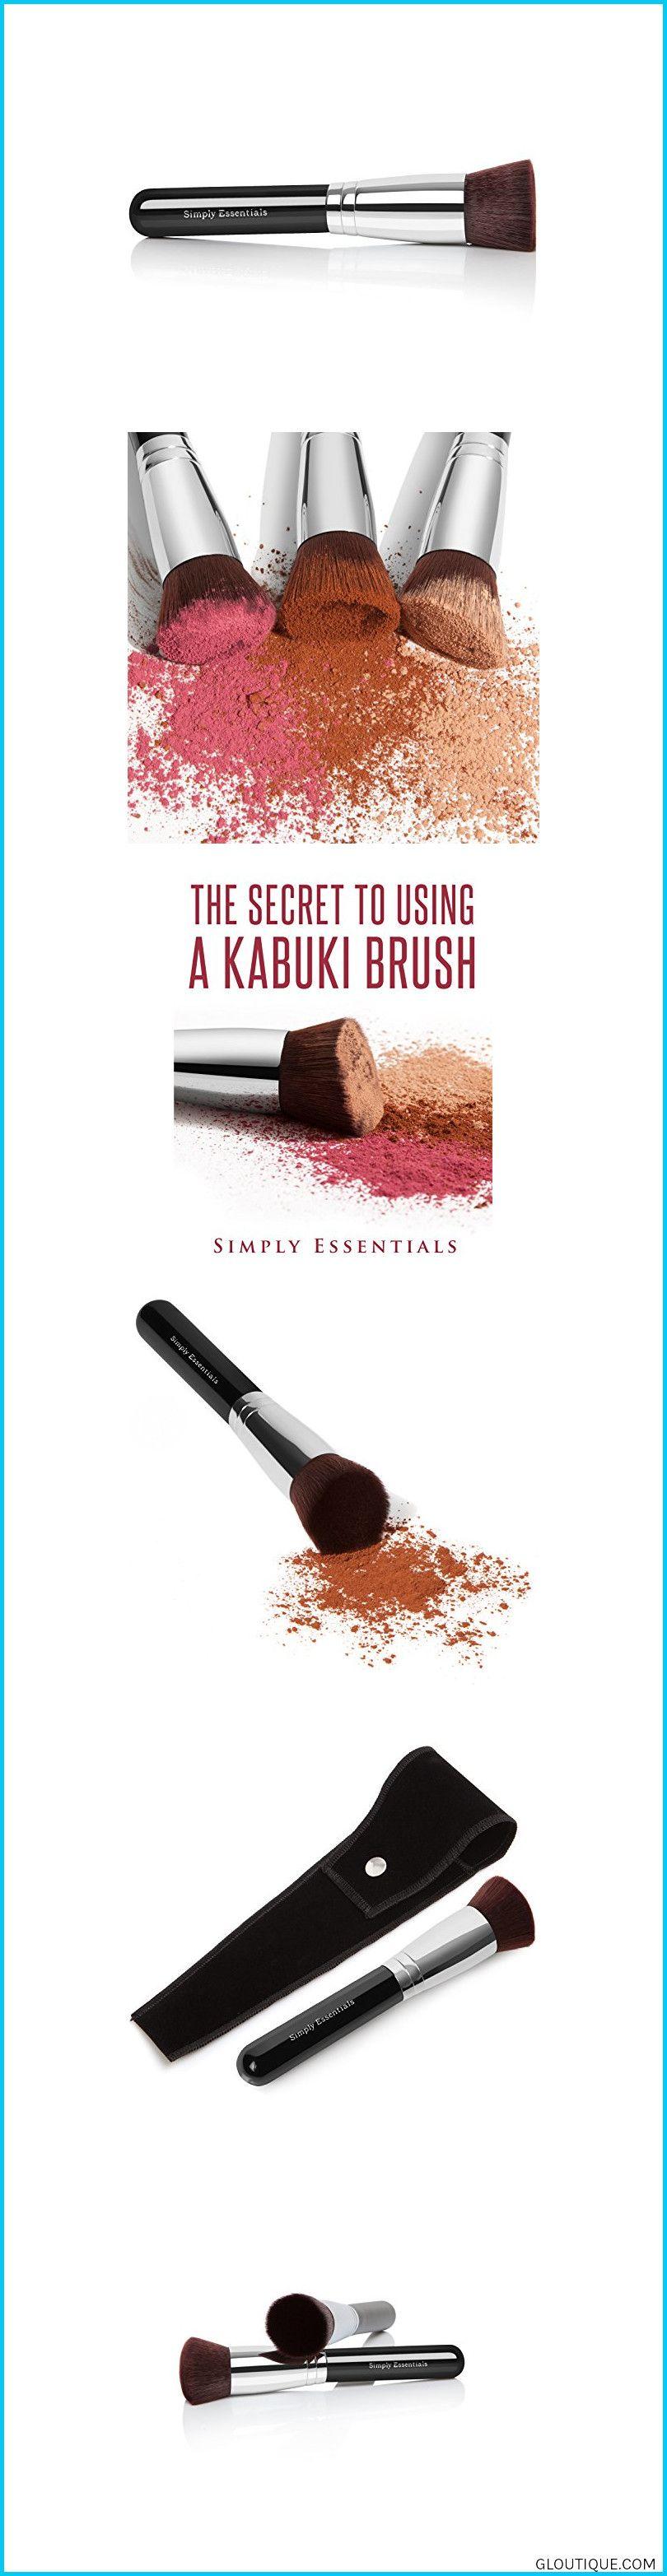 Kabuki Makeup Brush Flat Ebook Included This Brush